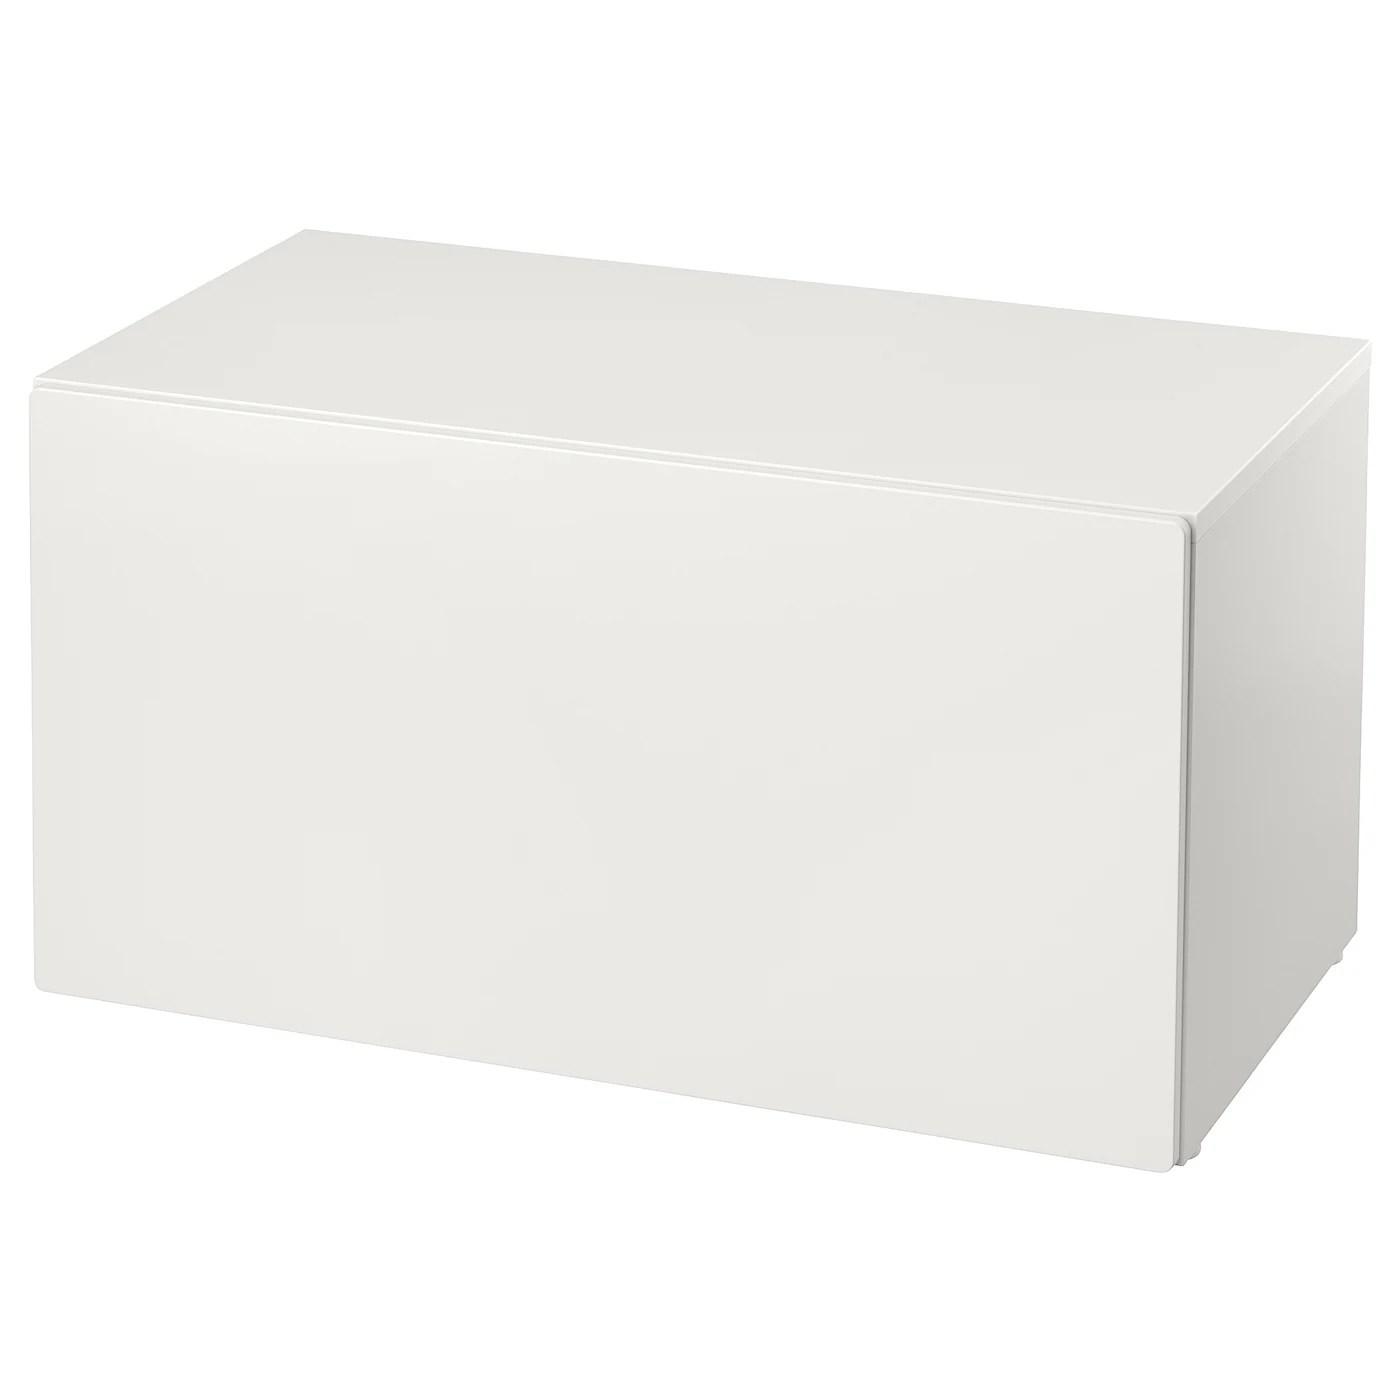 Smastad Banc Avec Rangement Jouets Blanc Blanc Ikea